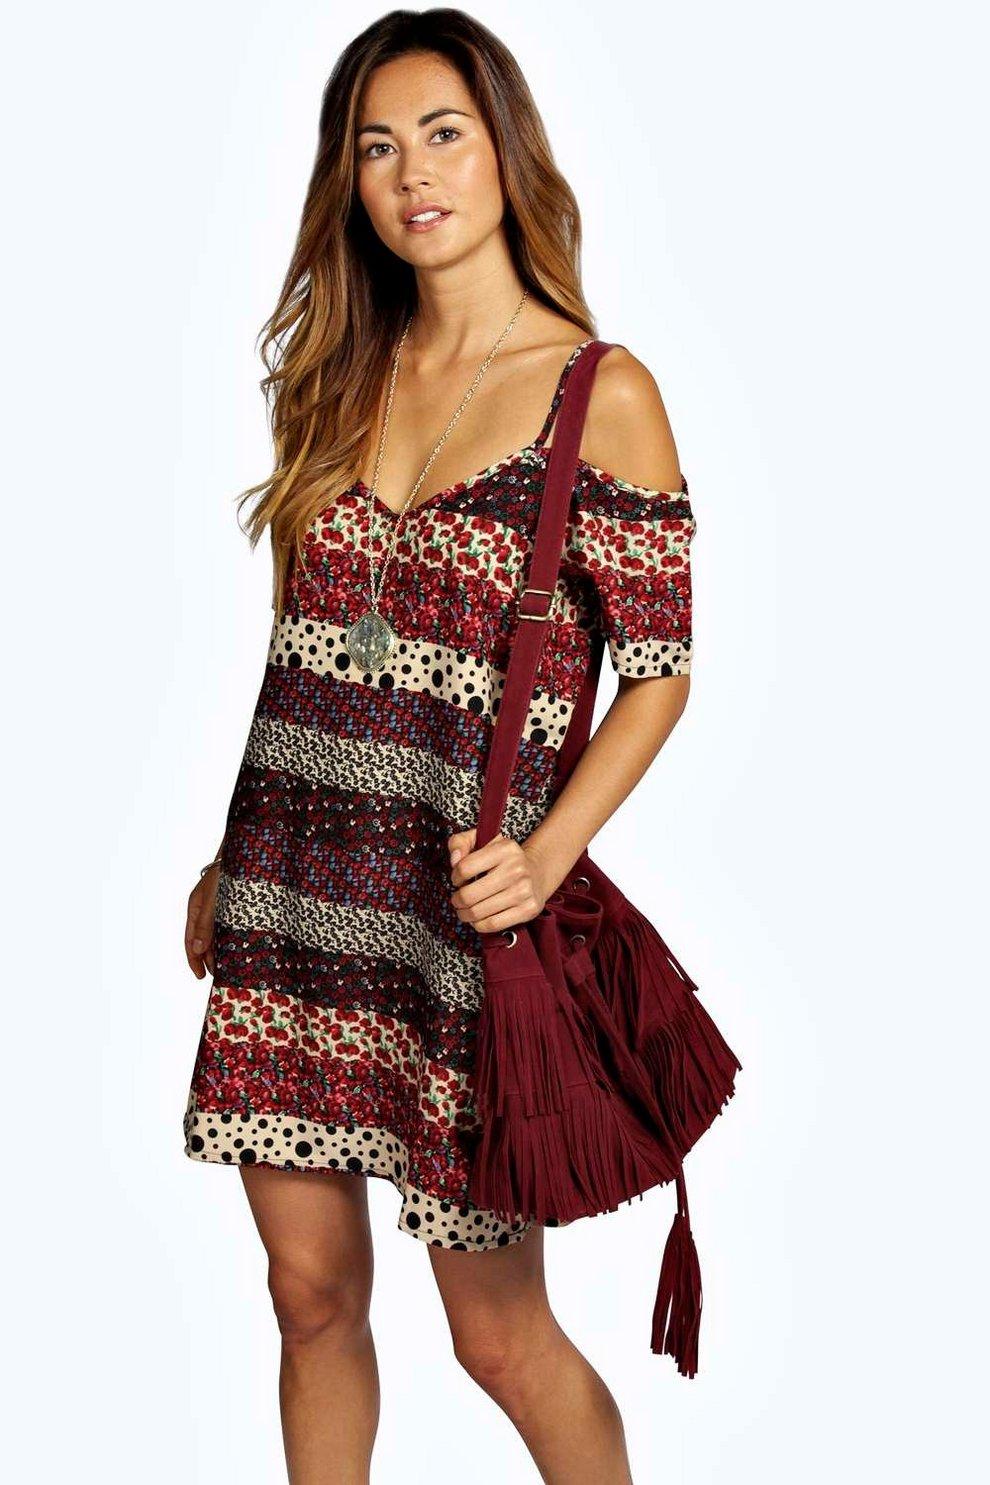 911f55f2b3391 Laura Woven Strappy Cold Shoulder Dress